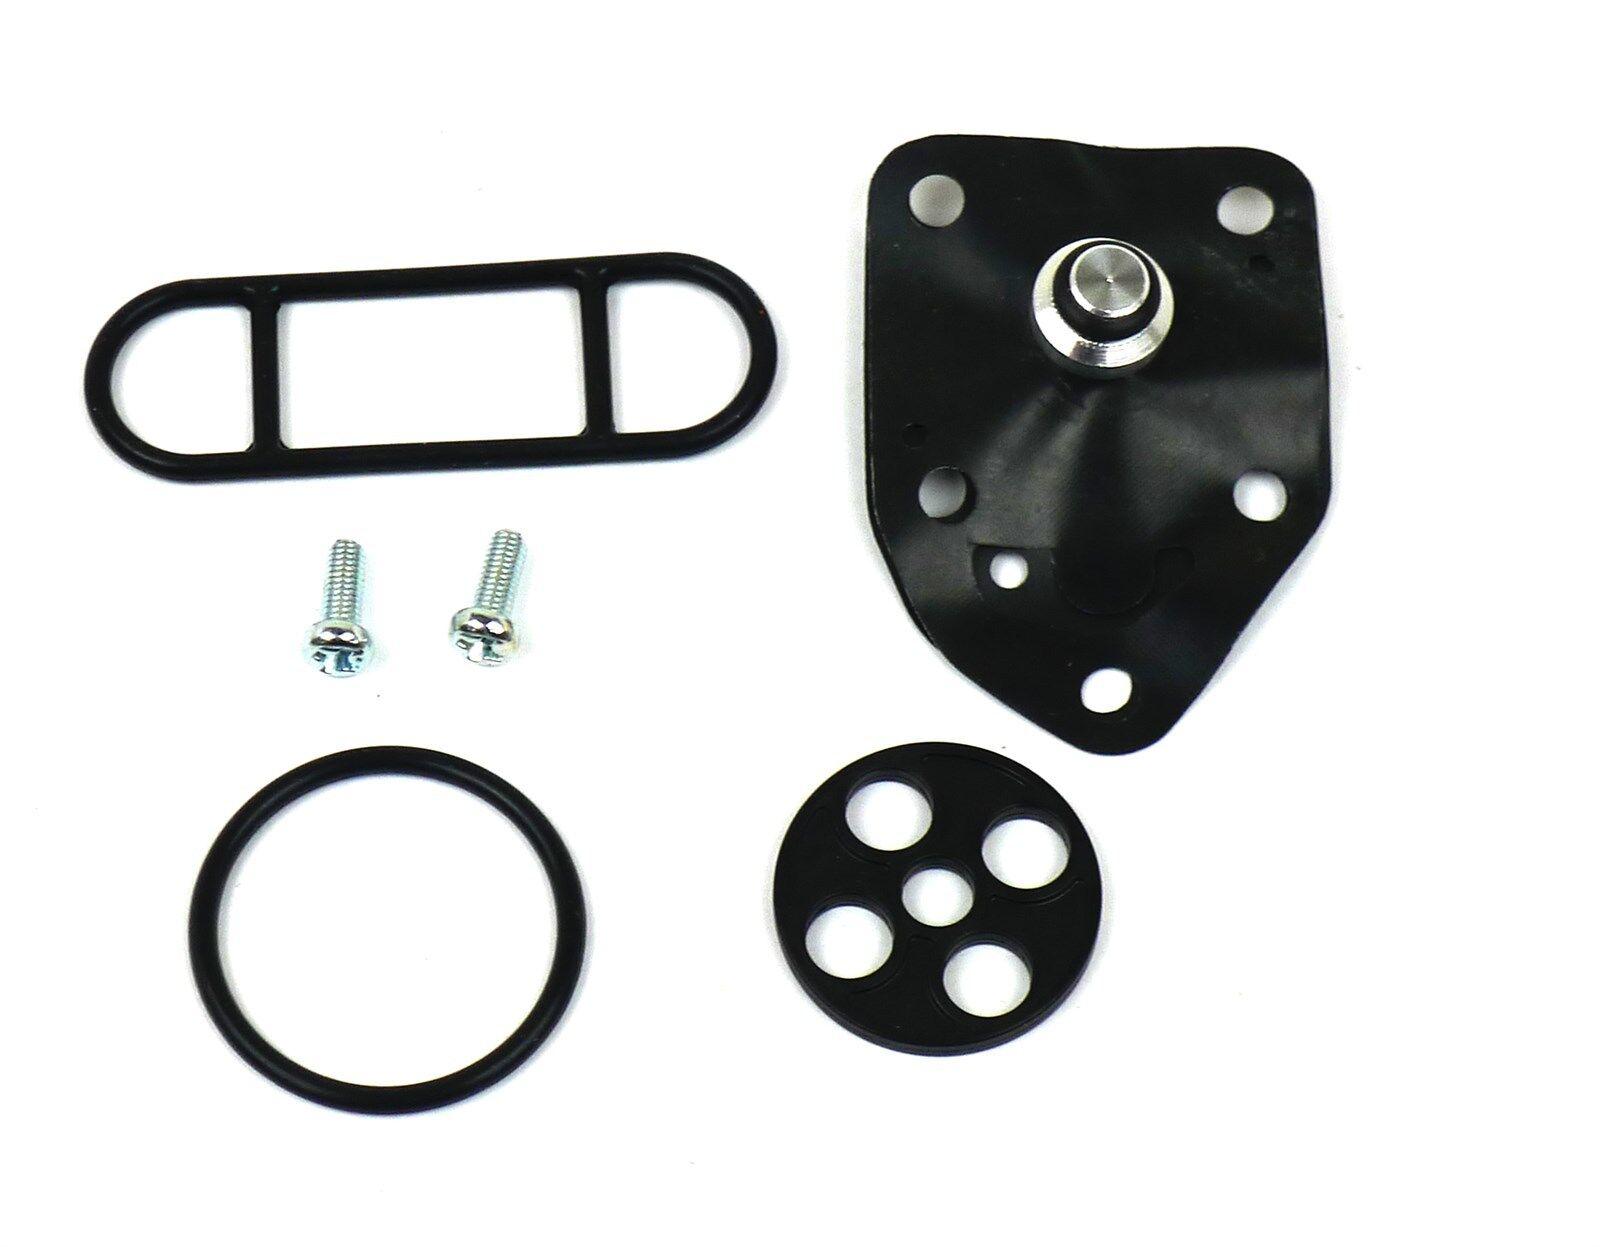 KR Fuel Tap Petcock Repair Kit YAMAHA XV 700 750 920 1000 Shutoff Valve Alpha